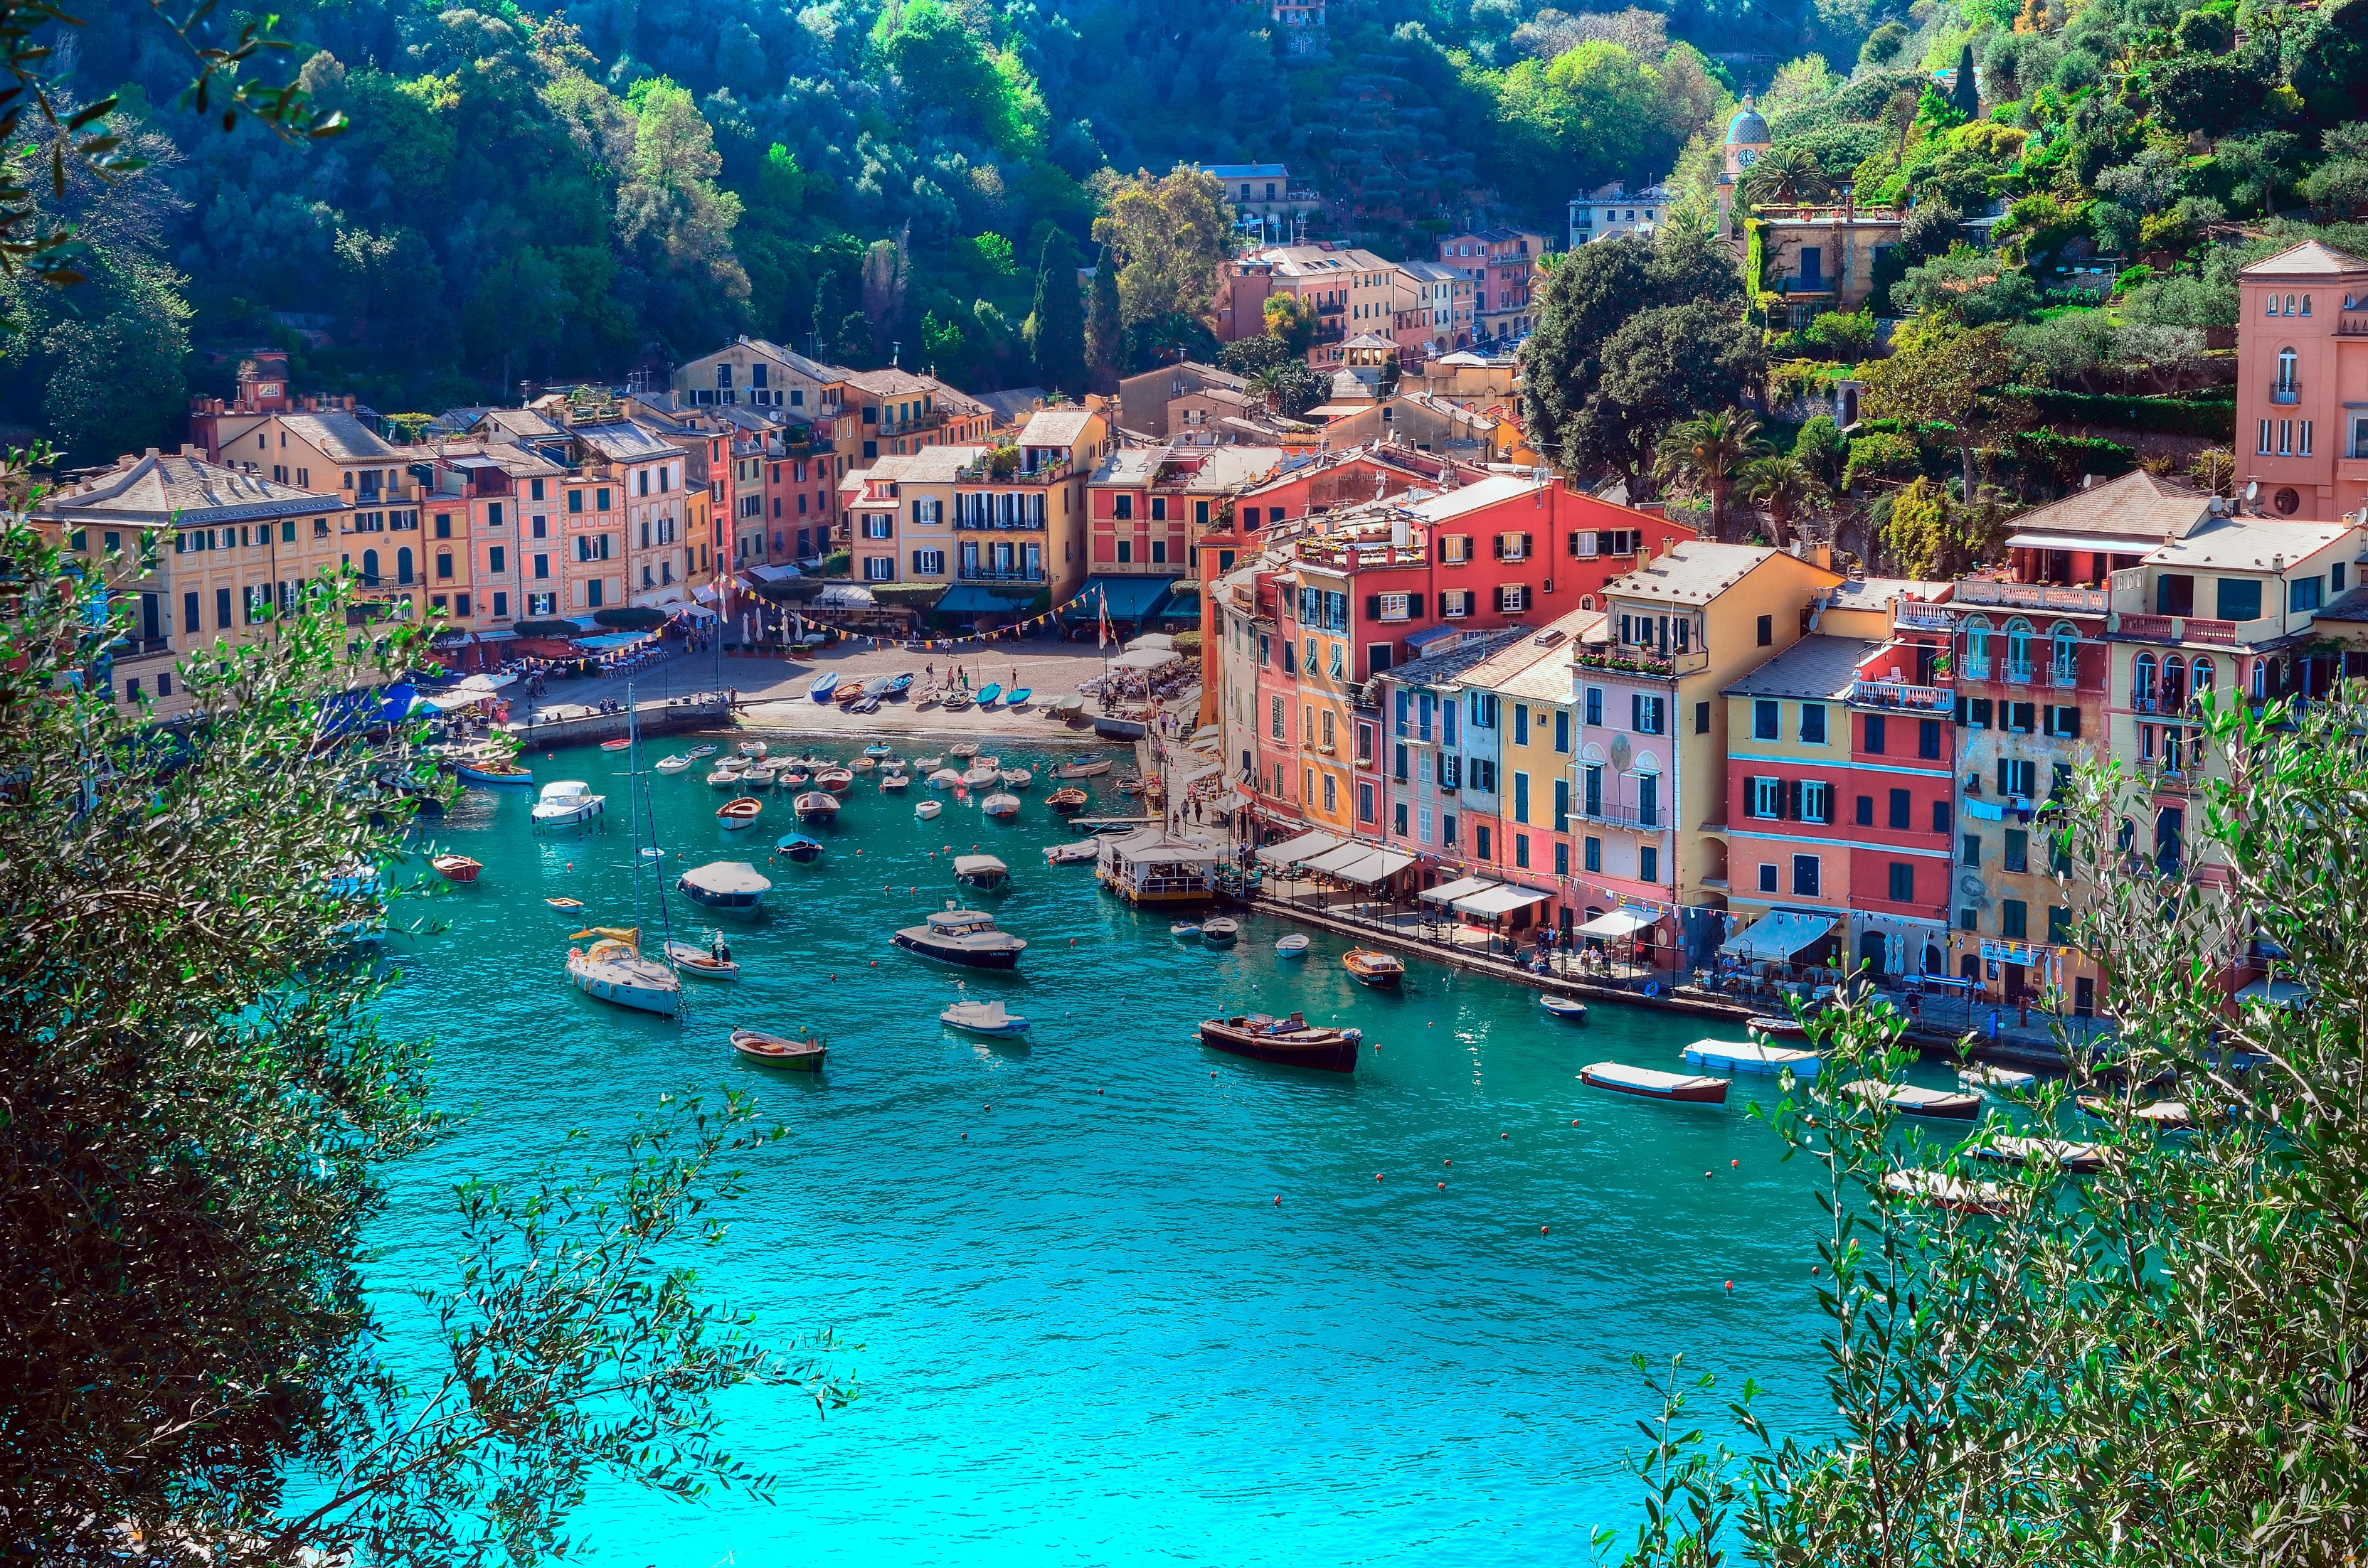 Agriturismi in Liguria